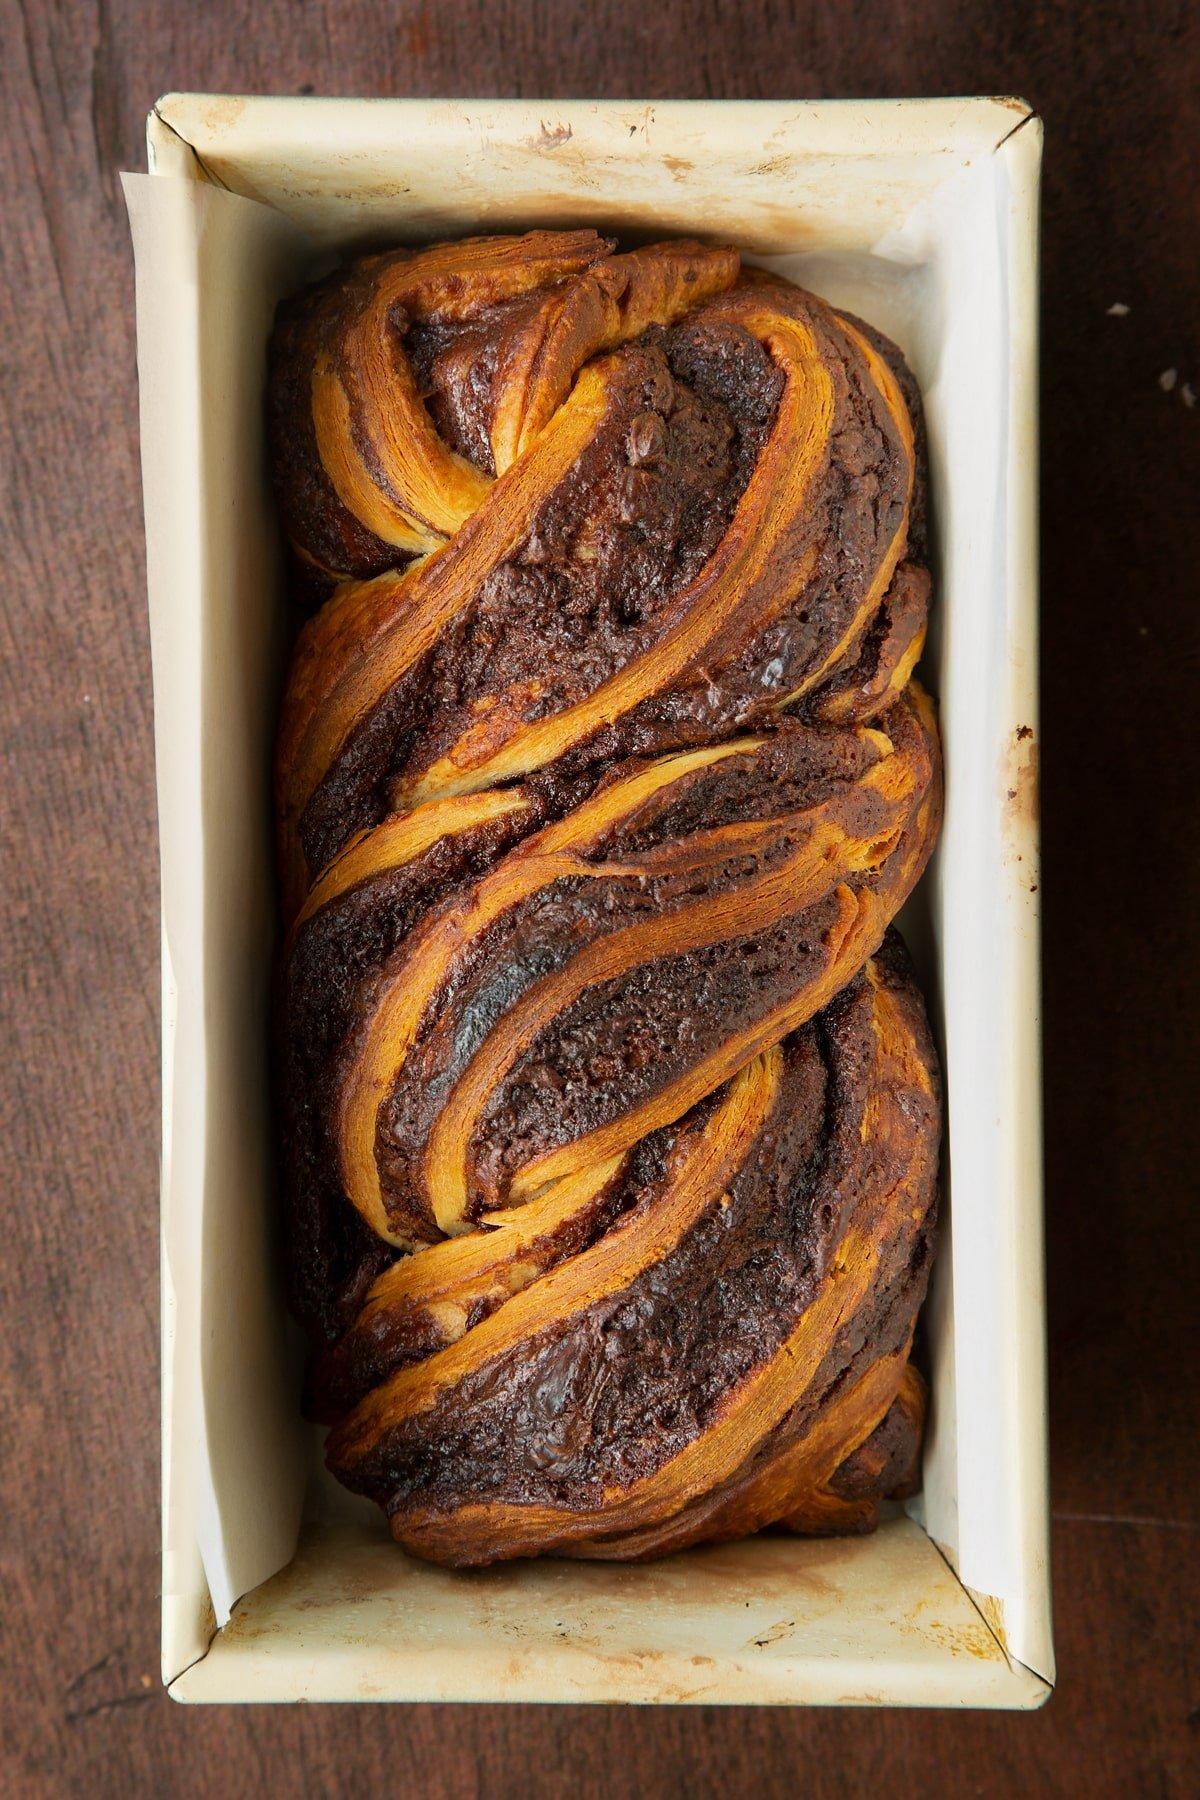 Baked cinnamon swirl babka in a lined baking tin.